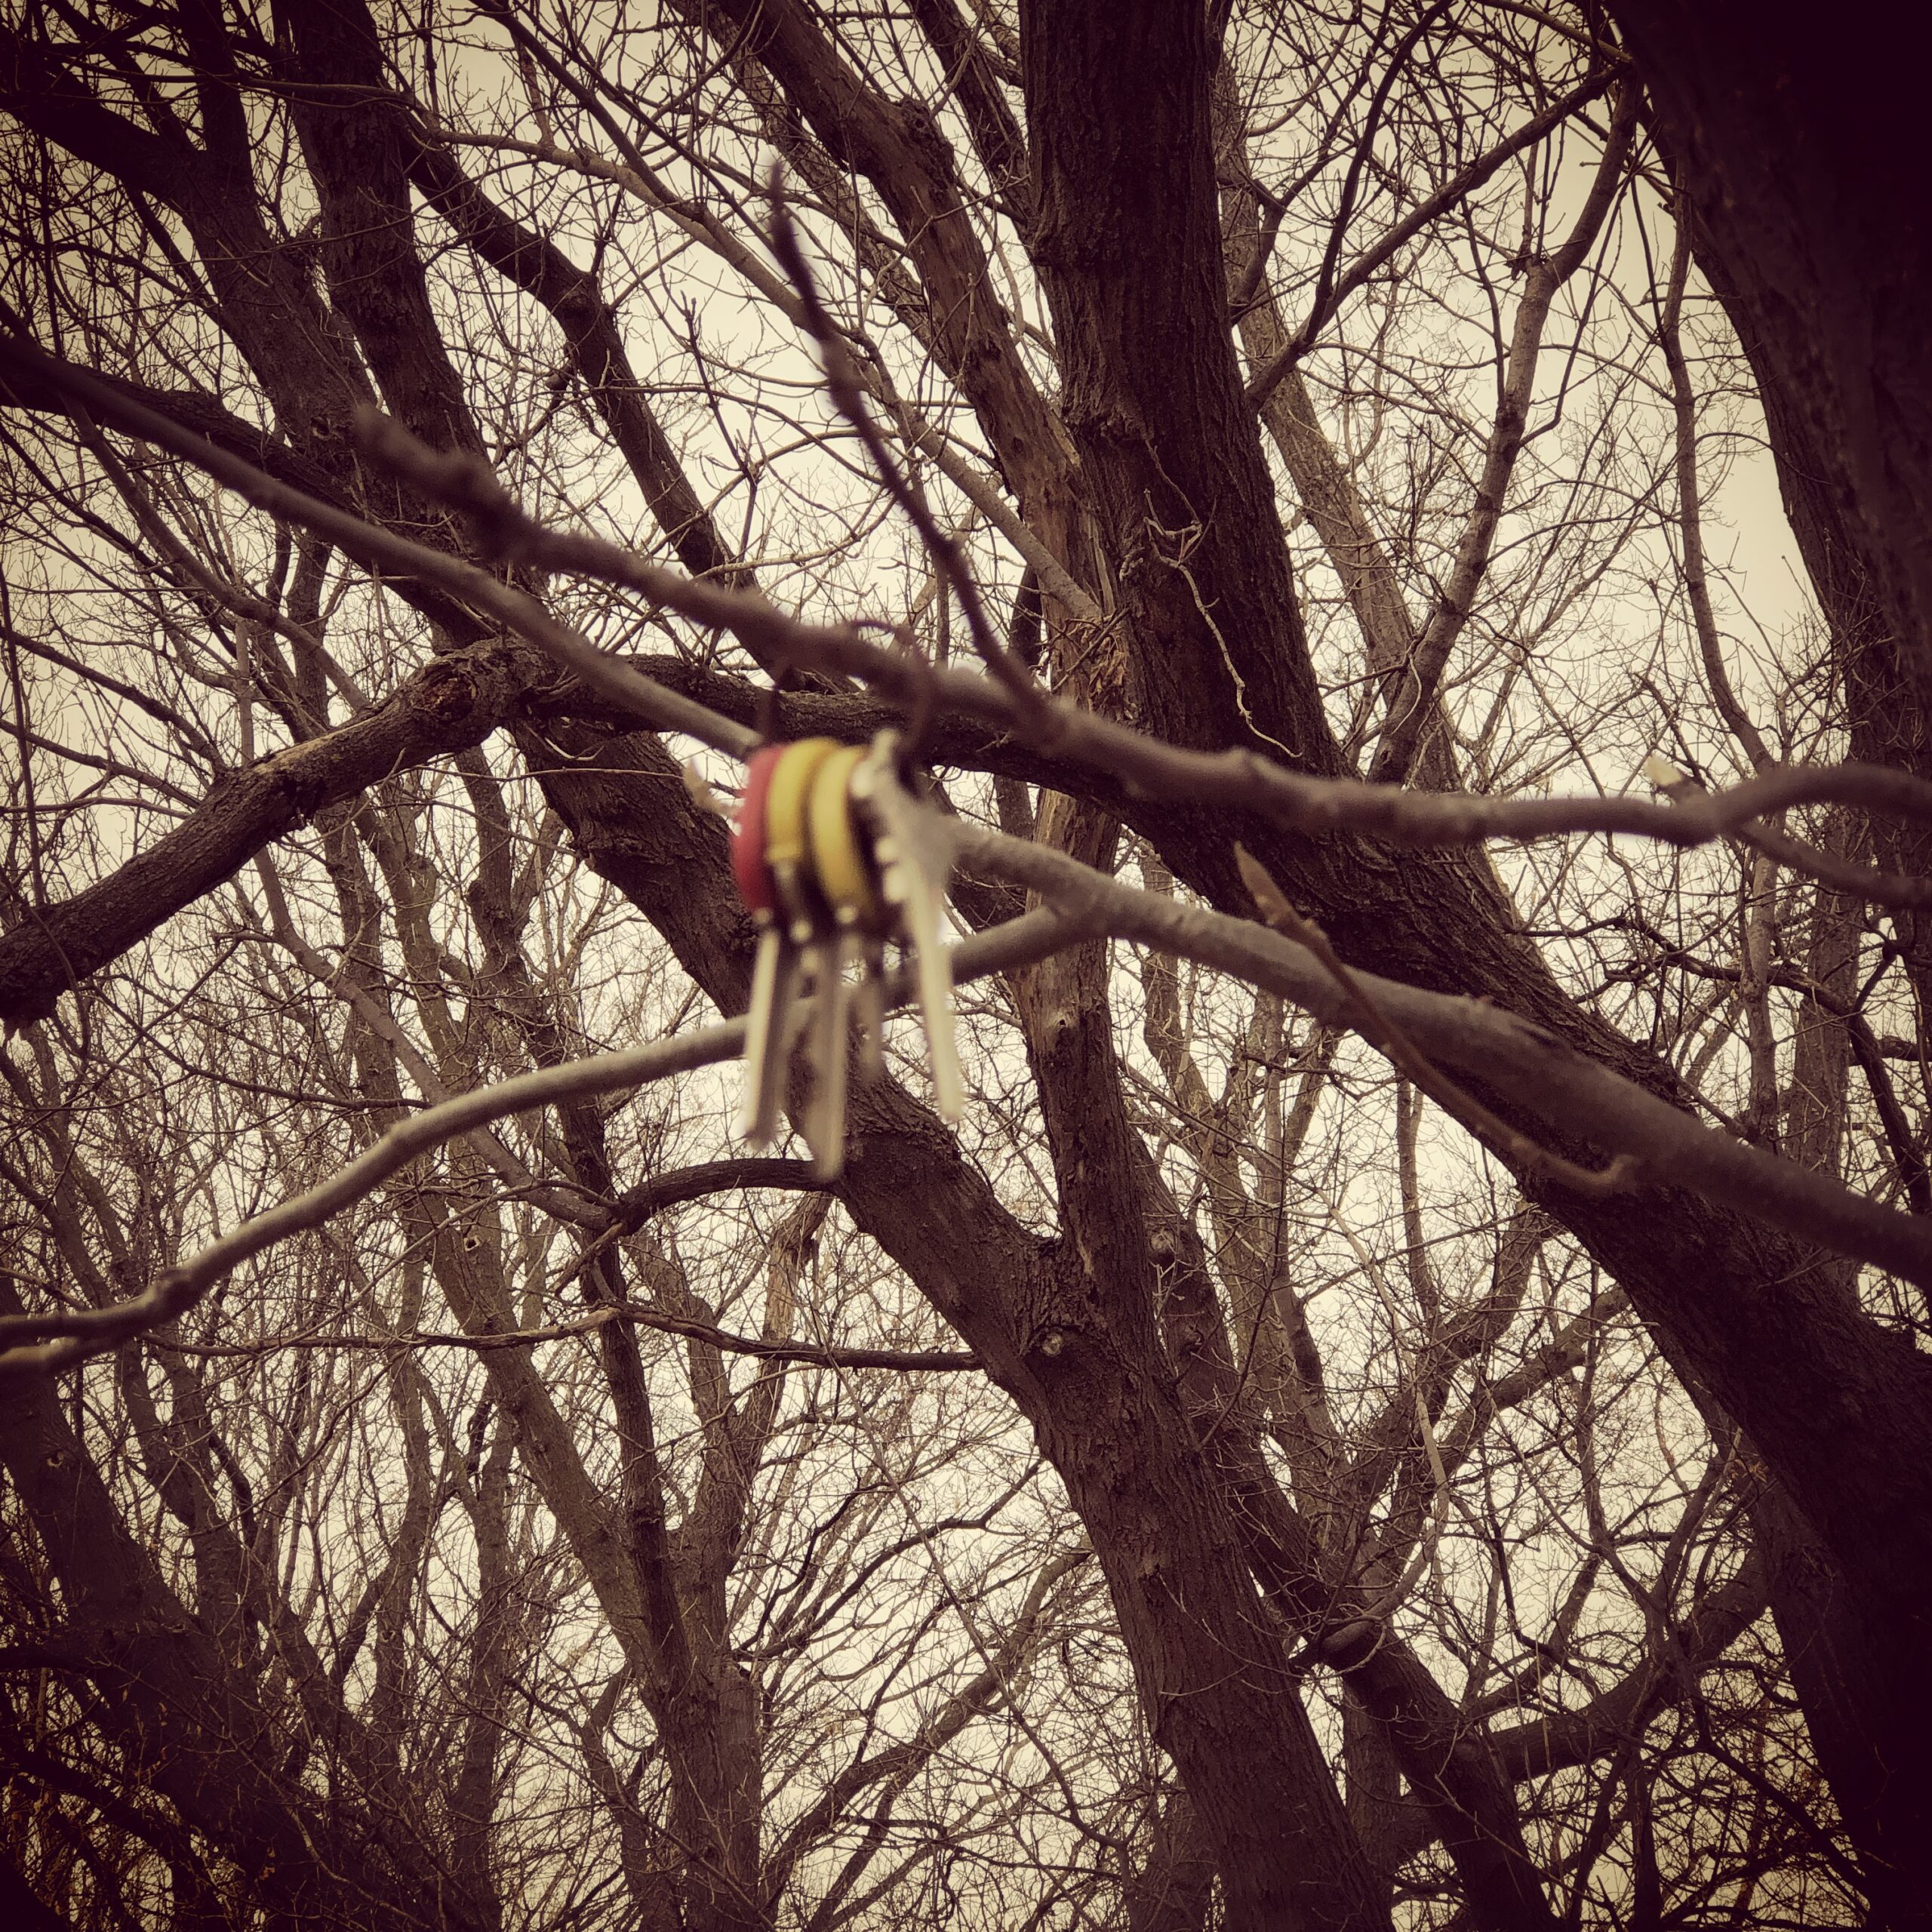 Portia_Keys-in-Tree